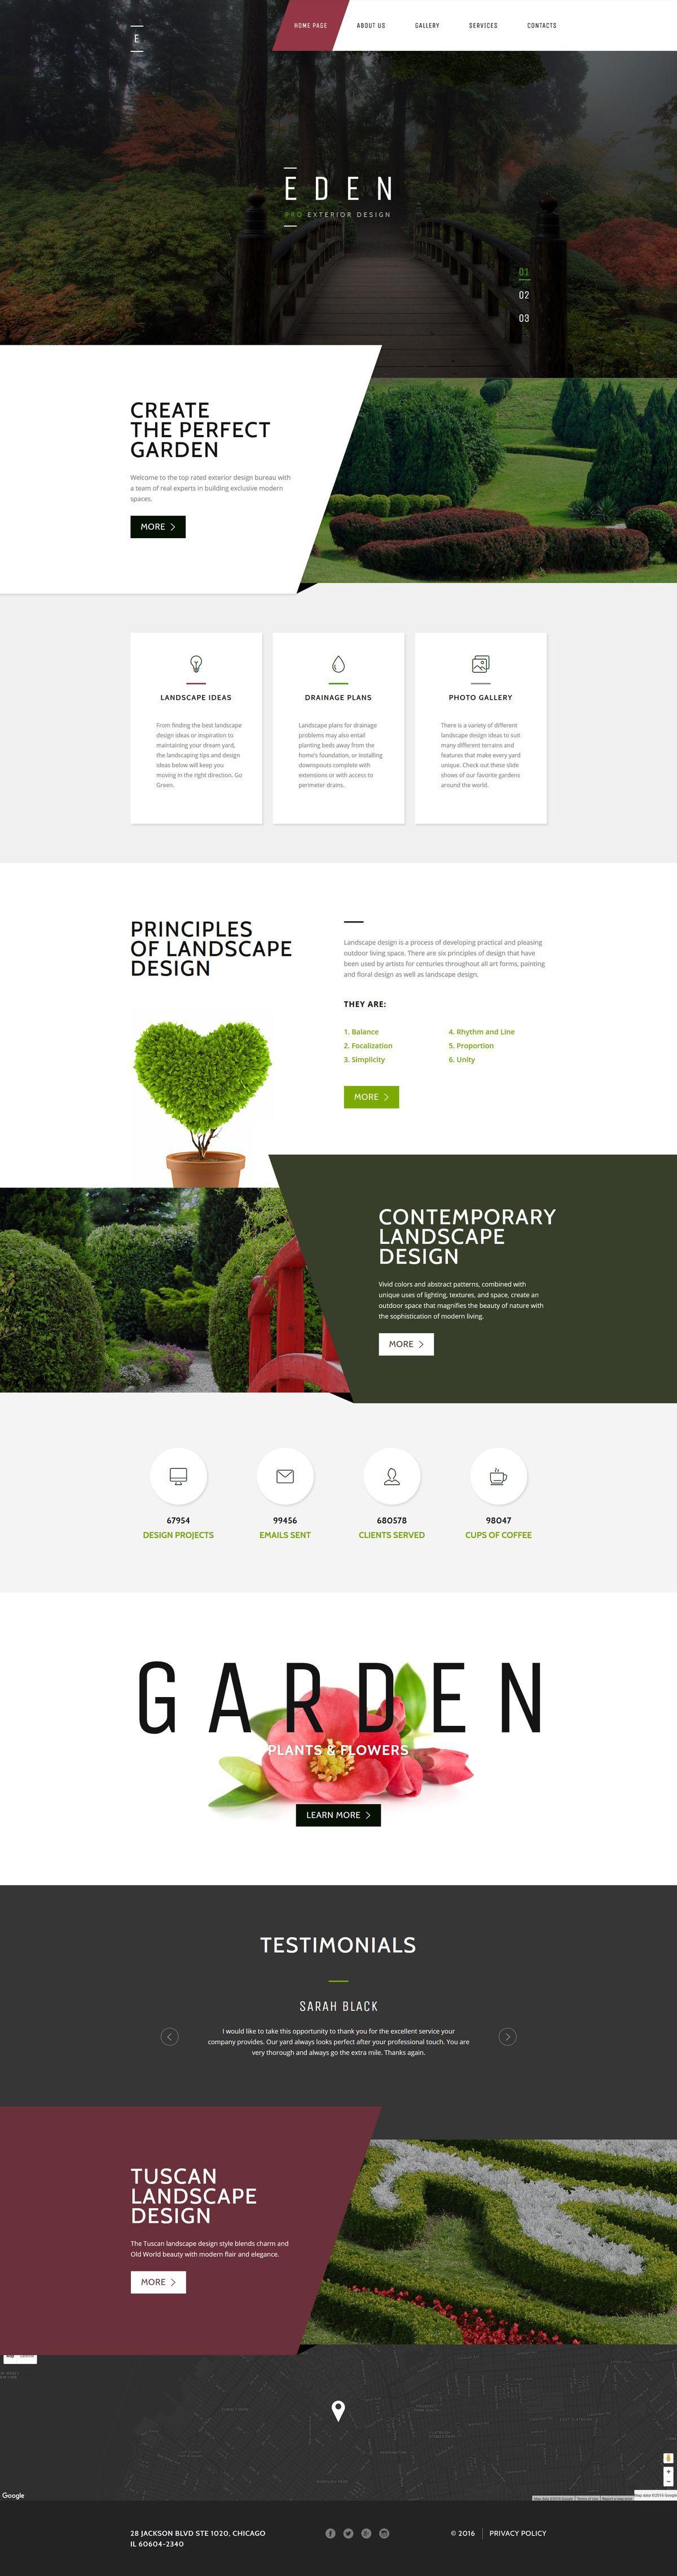 Garden Design Responsive Website Template #58440 http://www ...